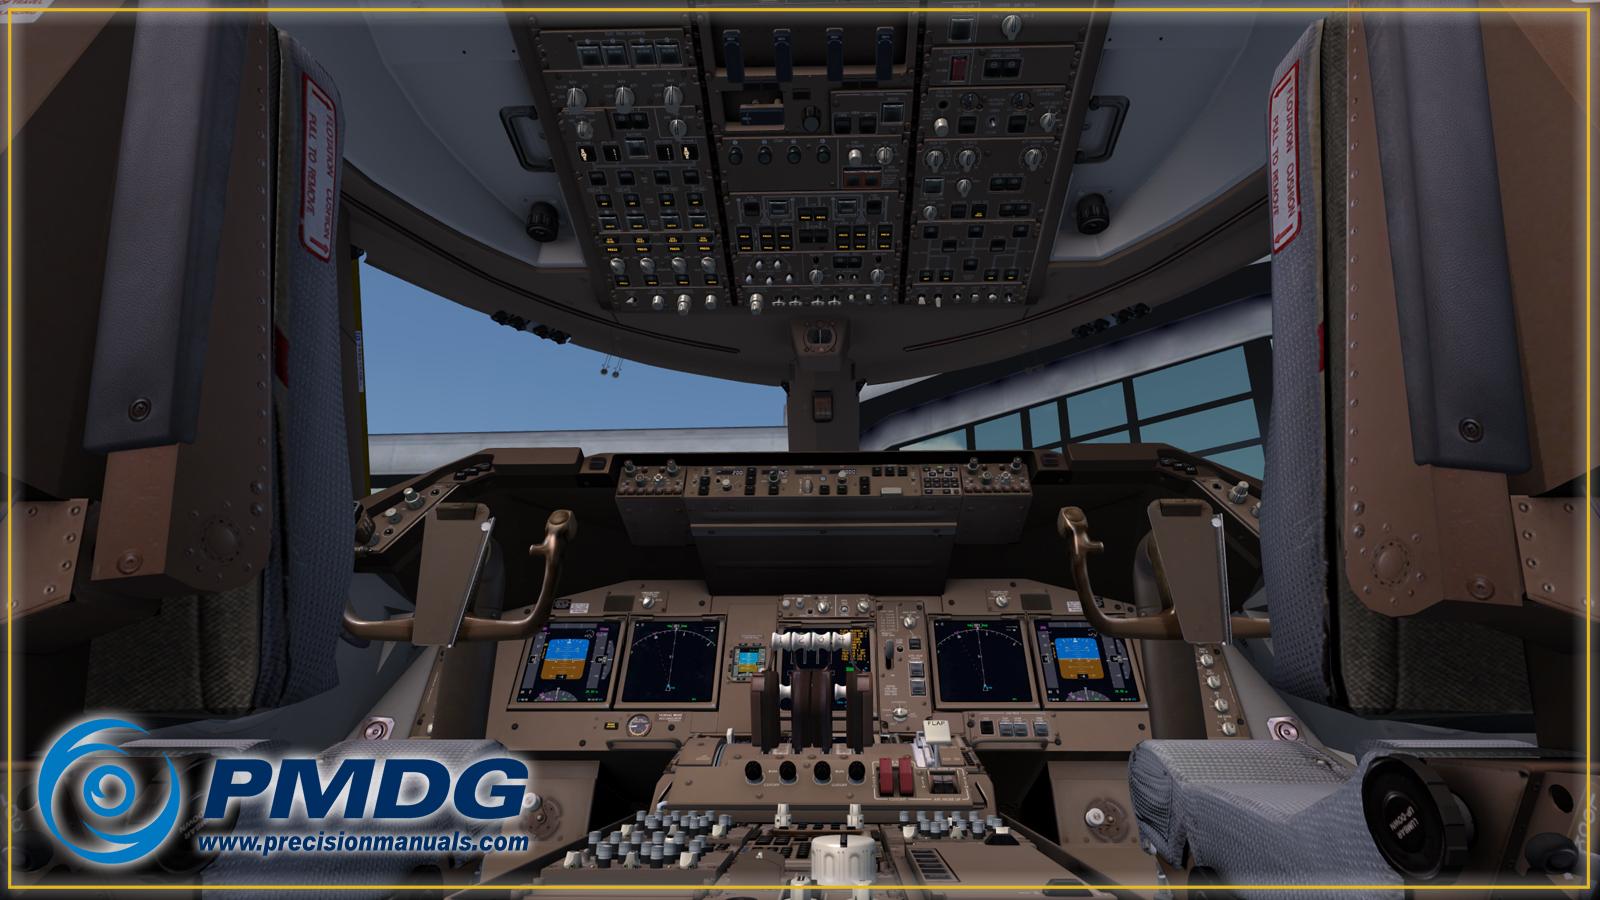 PMDG_748vc2.jpg